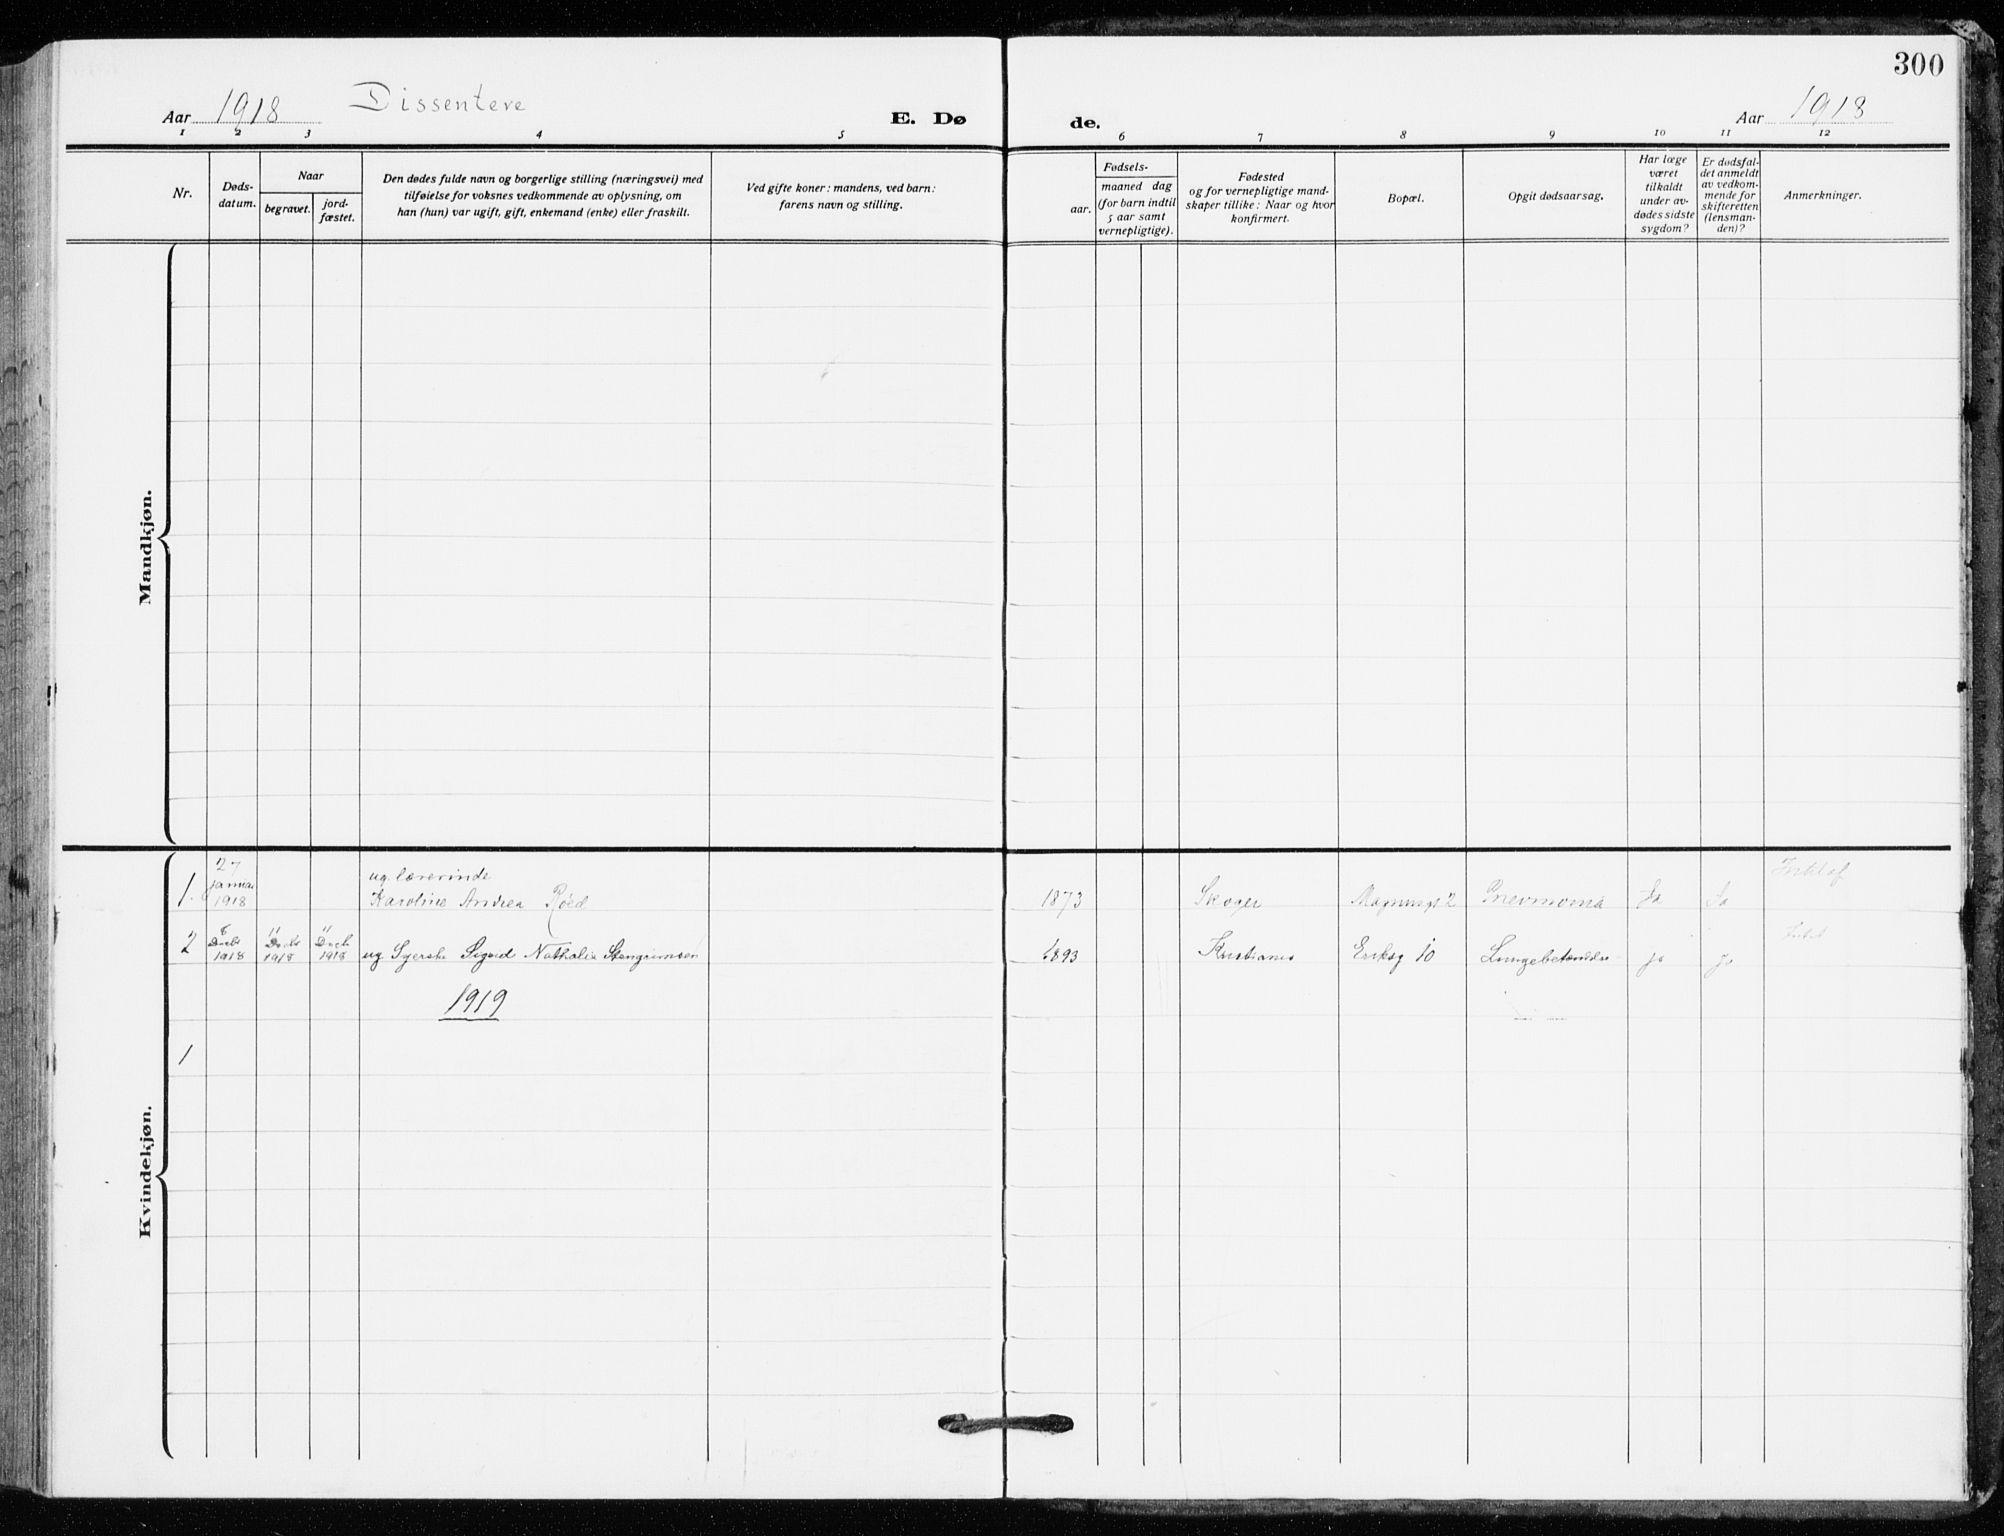 SAO, Kampen prestekontor Kirkebøker, F/Fa/L0013: Ministerialbok nr. I 13, 1917-1922, s. 300